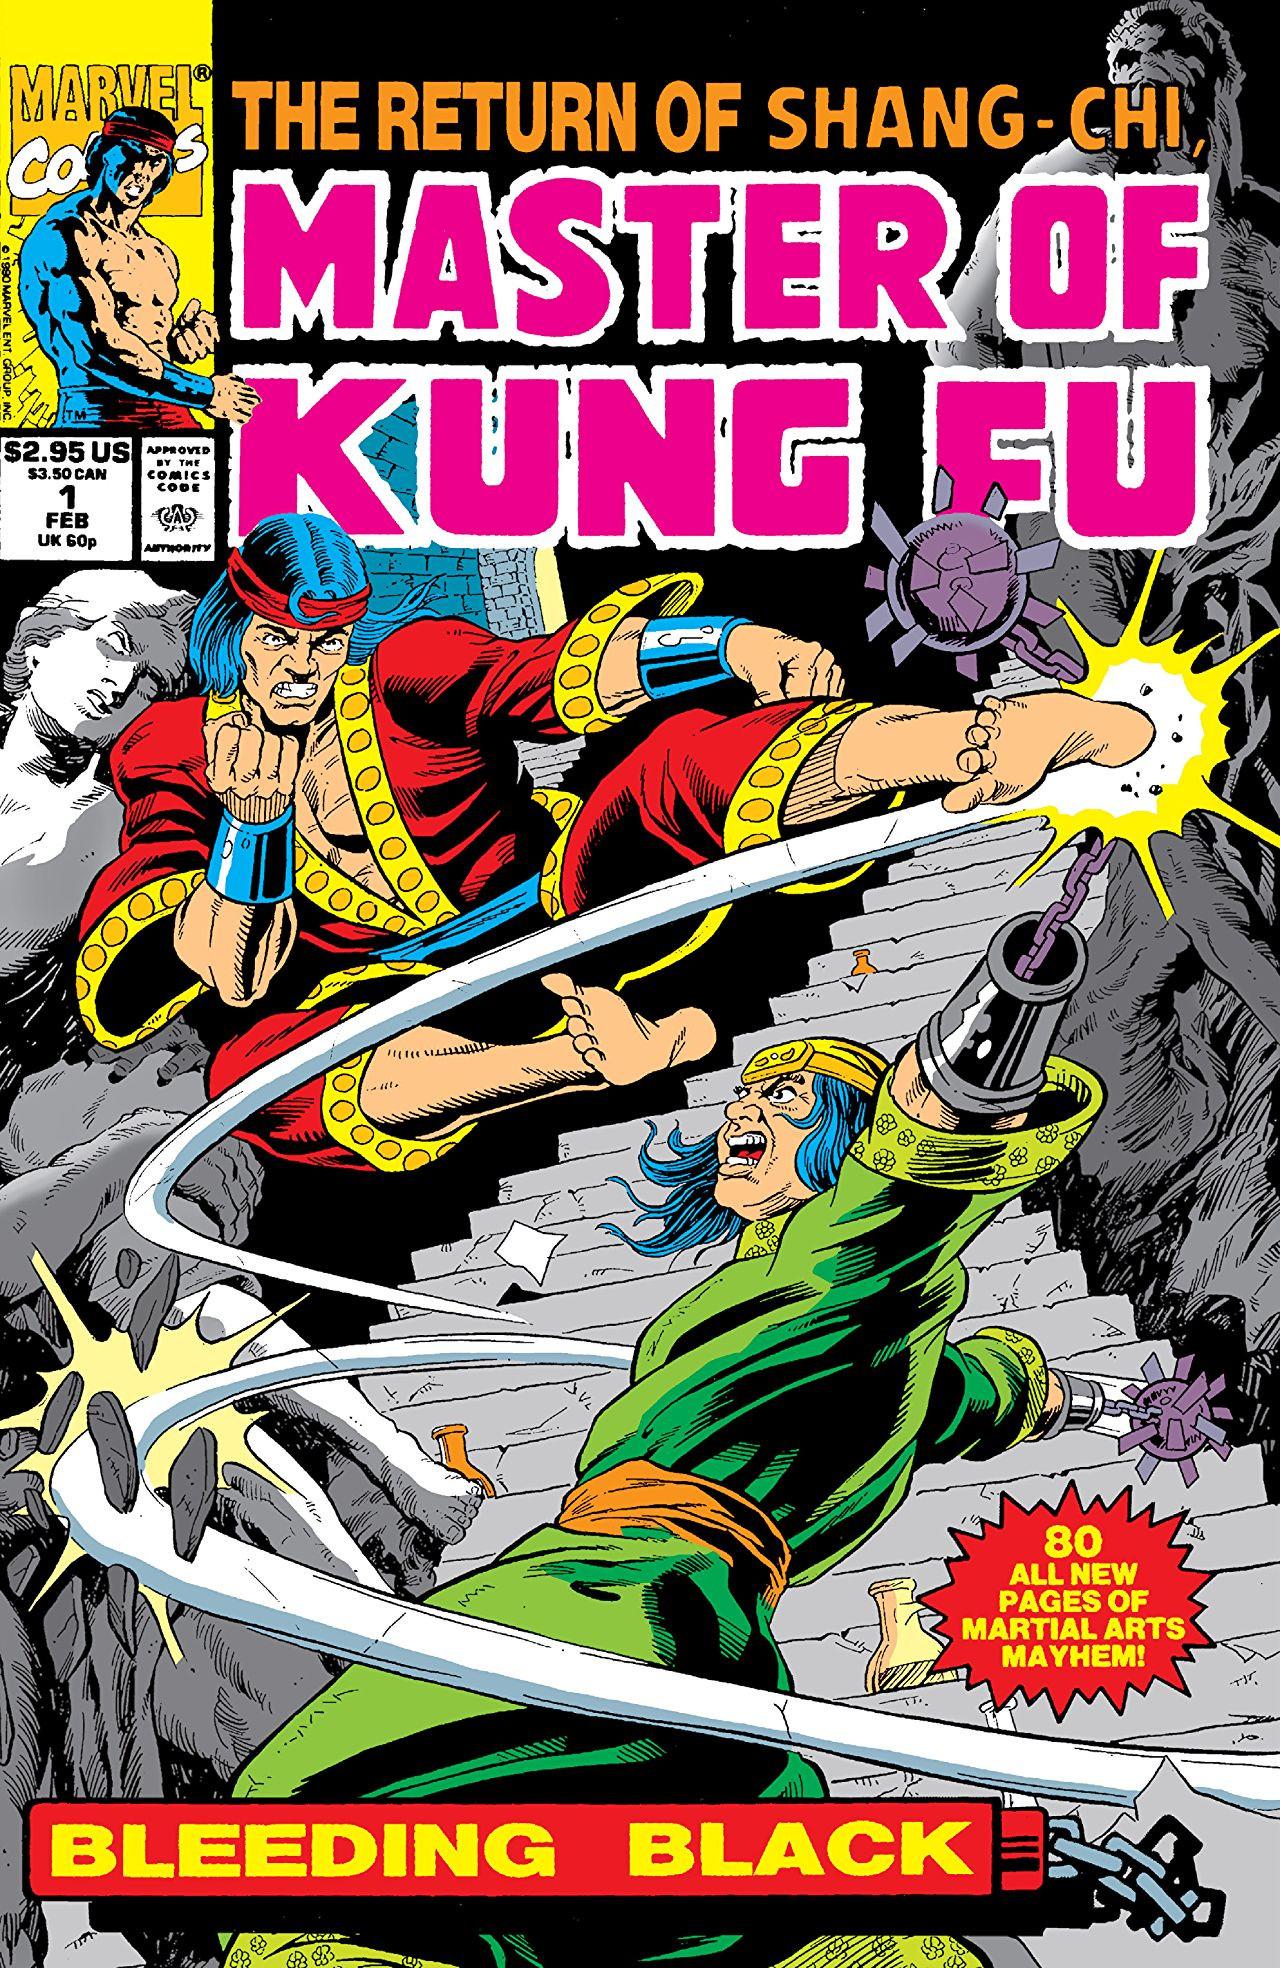 The Return of Shang Chi - Master of Kung Fu: Bleeding Black (1990)